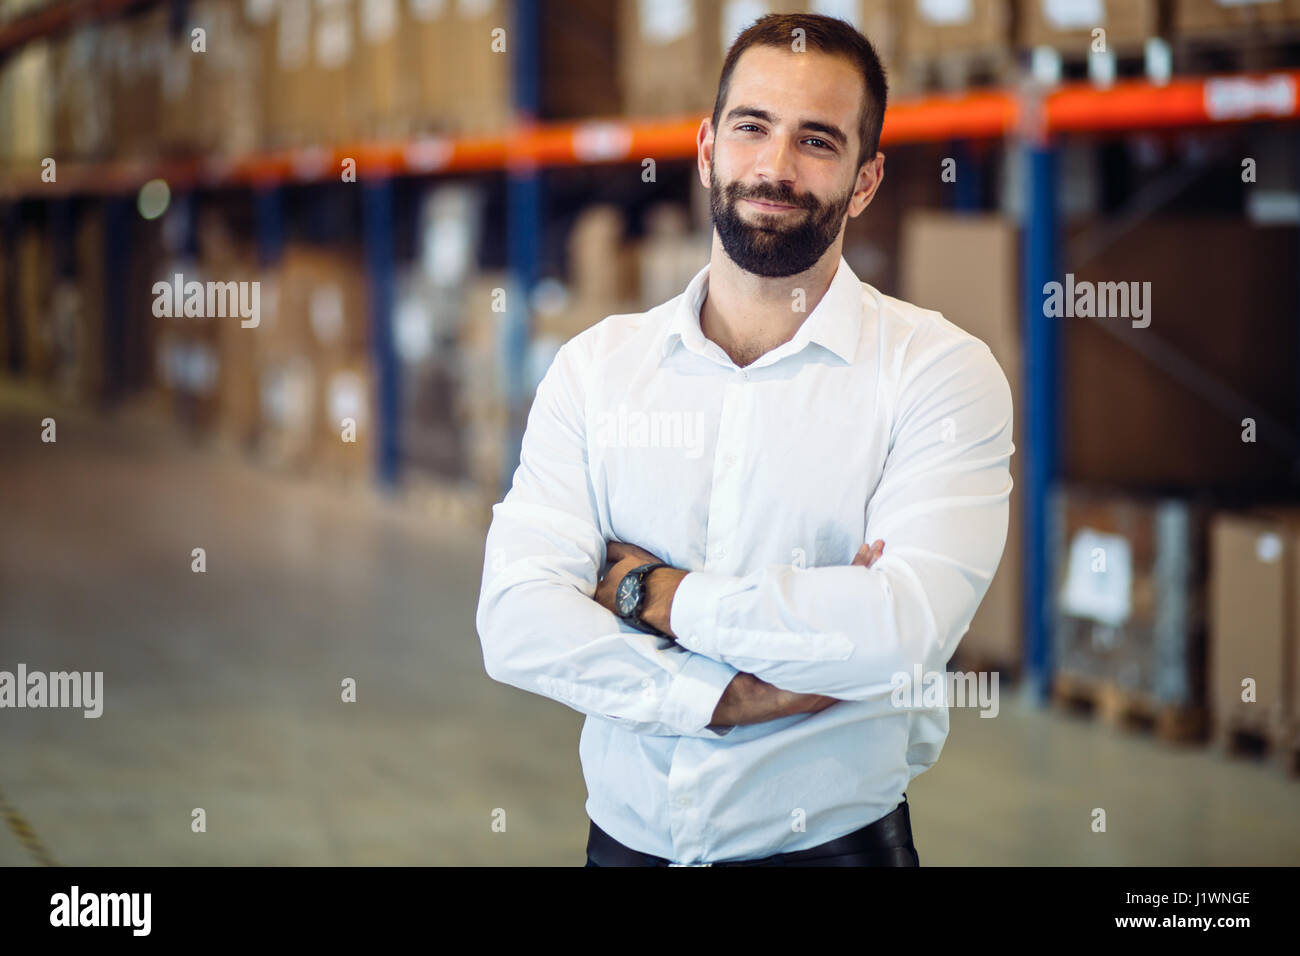 Logistics manager warehouse portrait - Stock Image